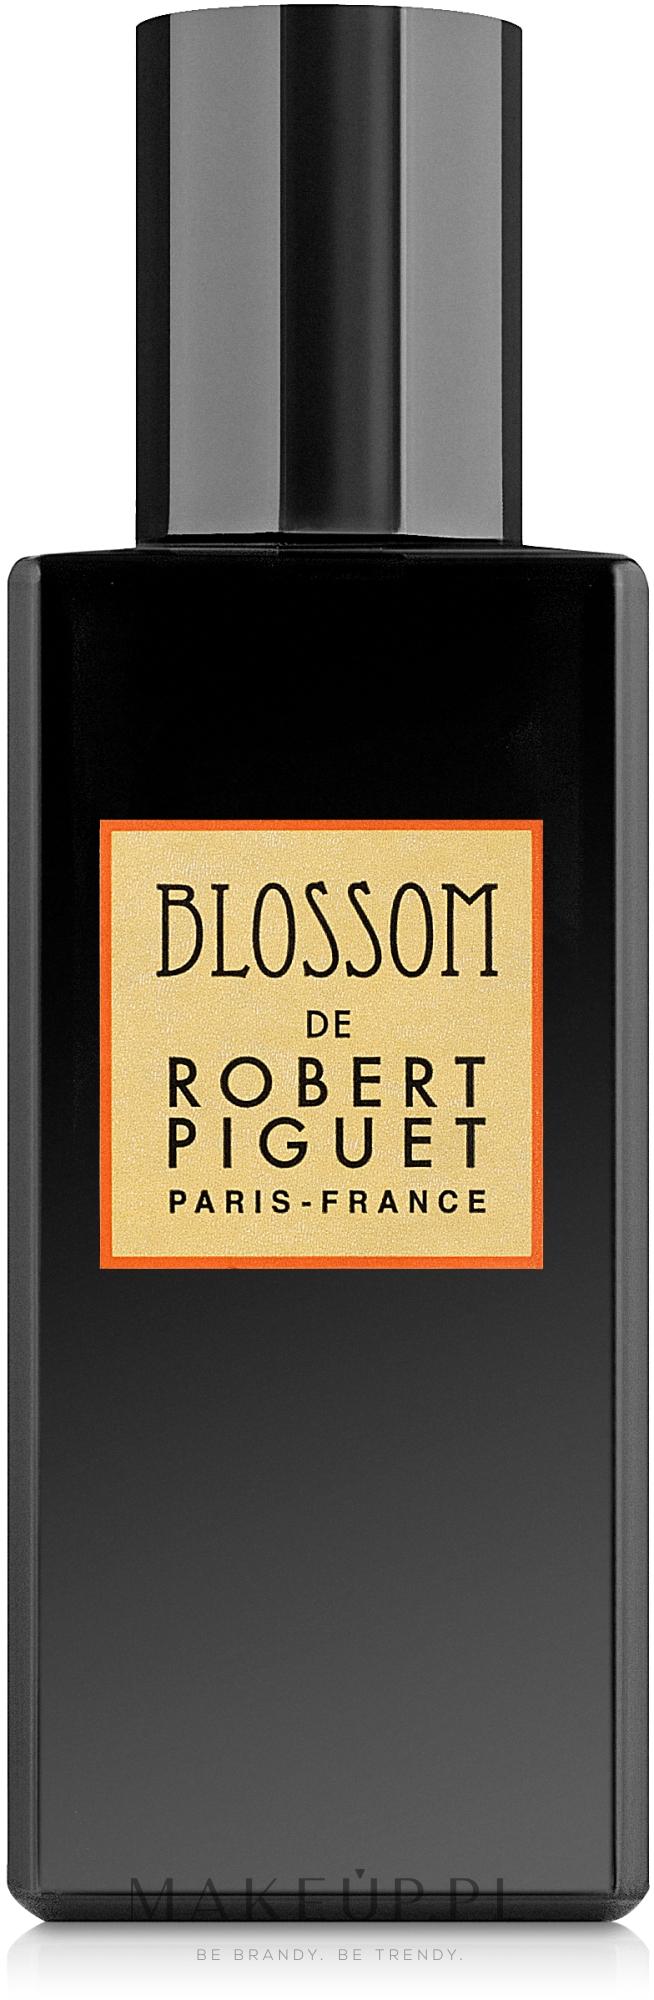 robert piguet pacific collection - blossom